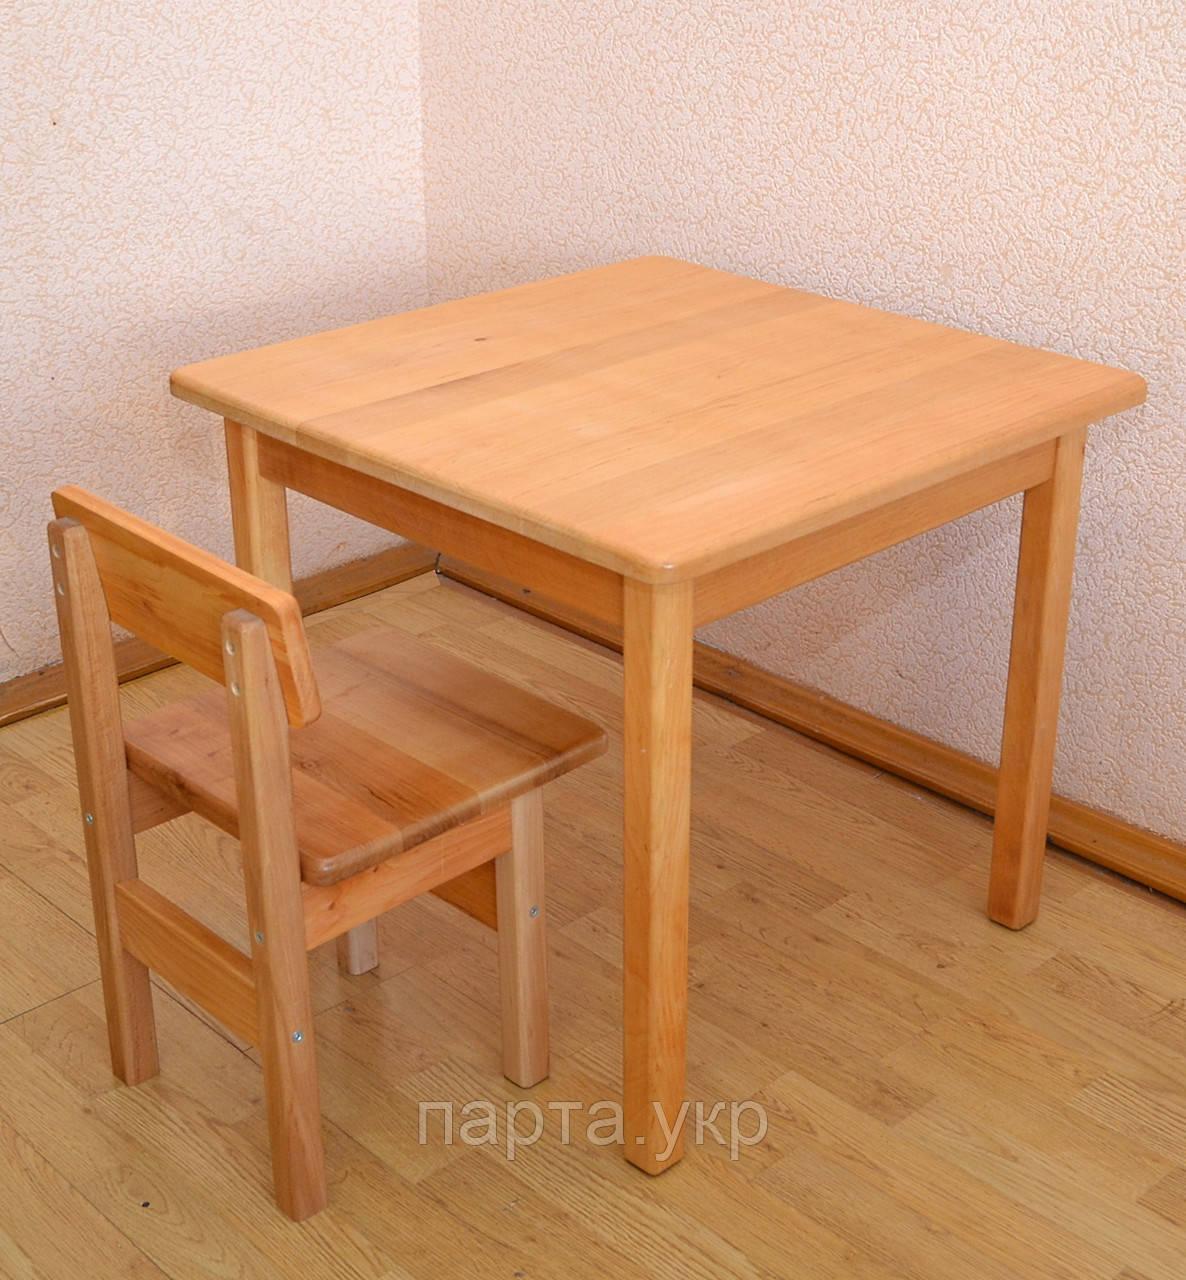 Детский стол и стул, Ольха